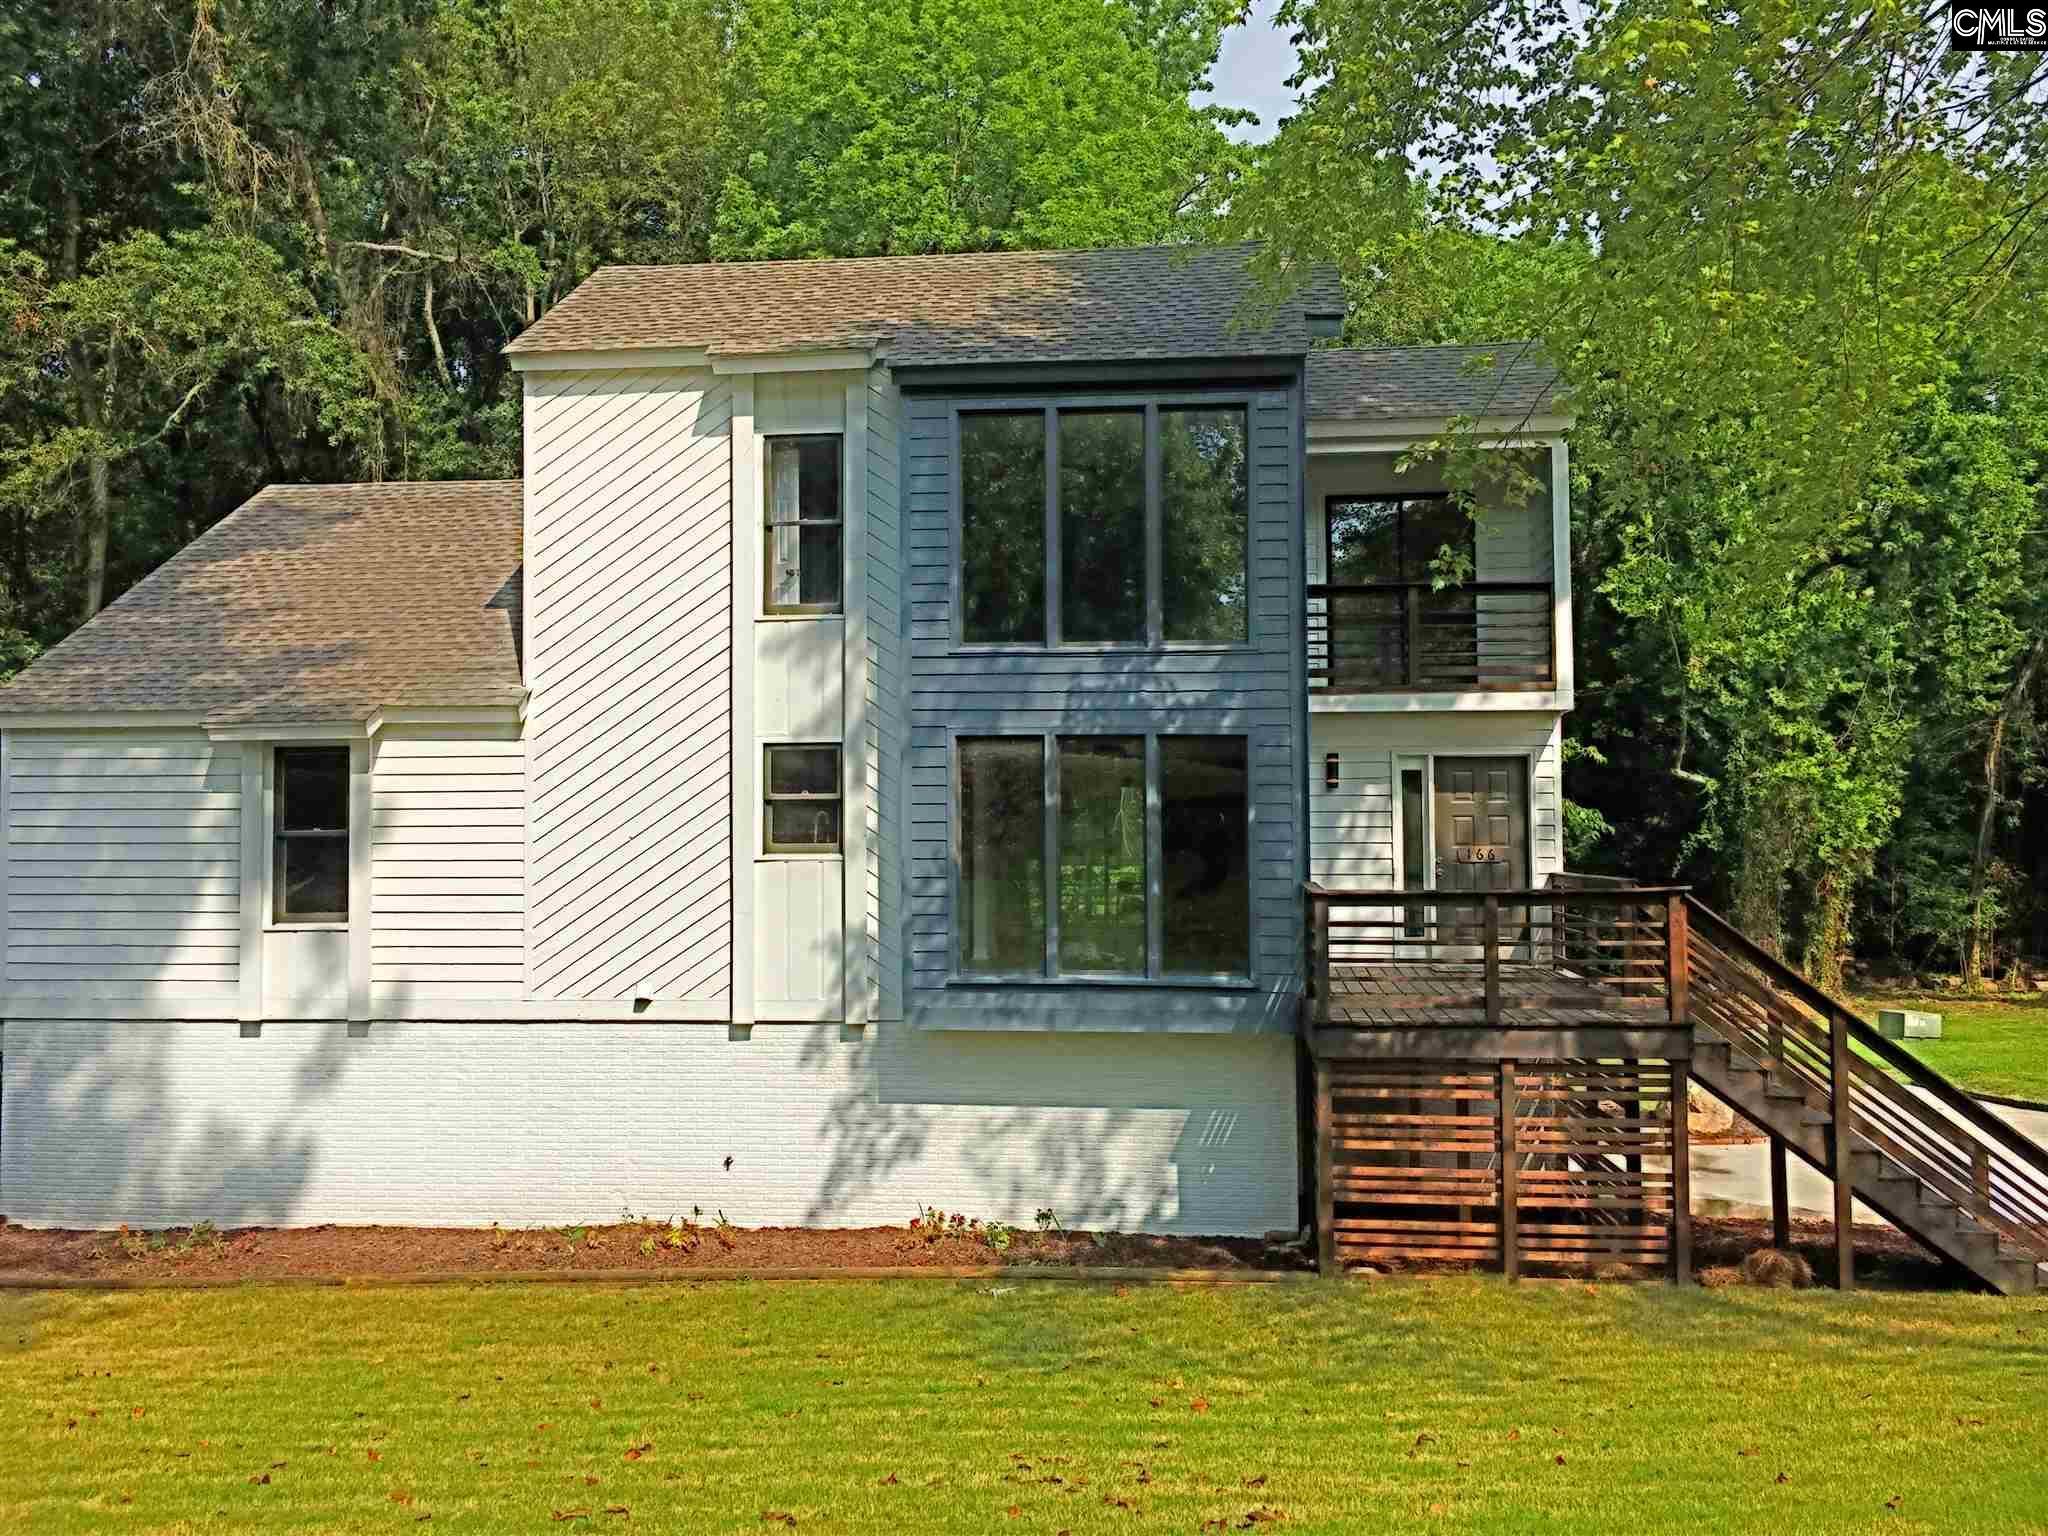 166 Cokesdale Columbia, SC 29212